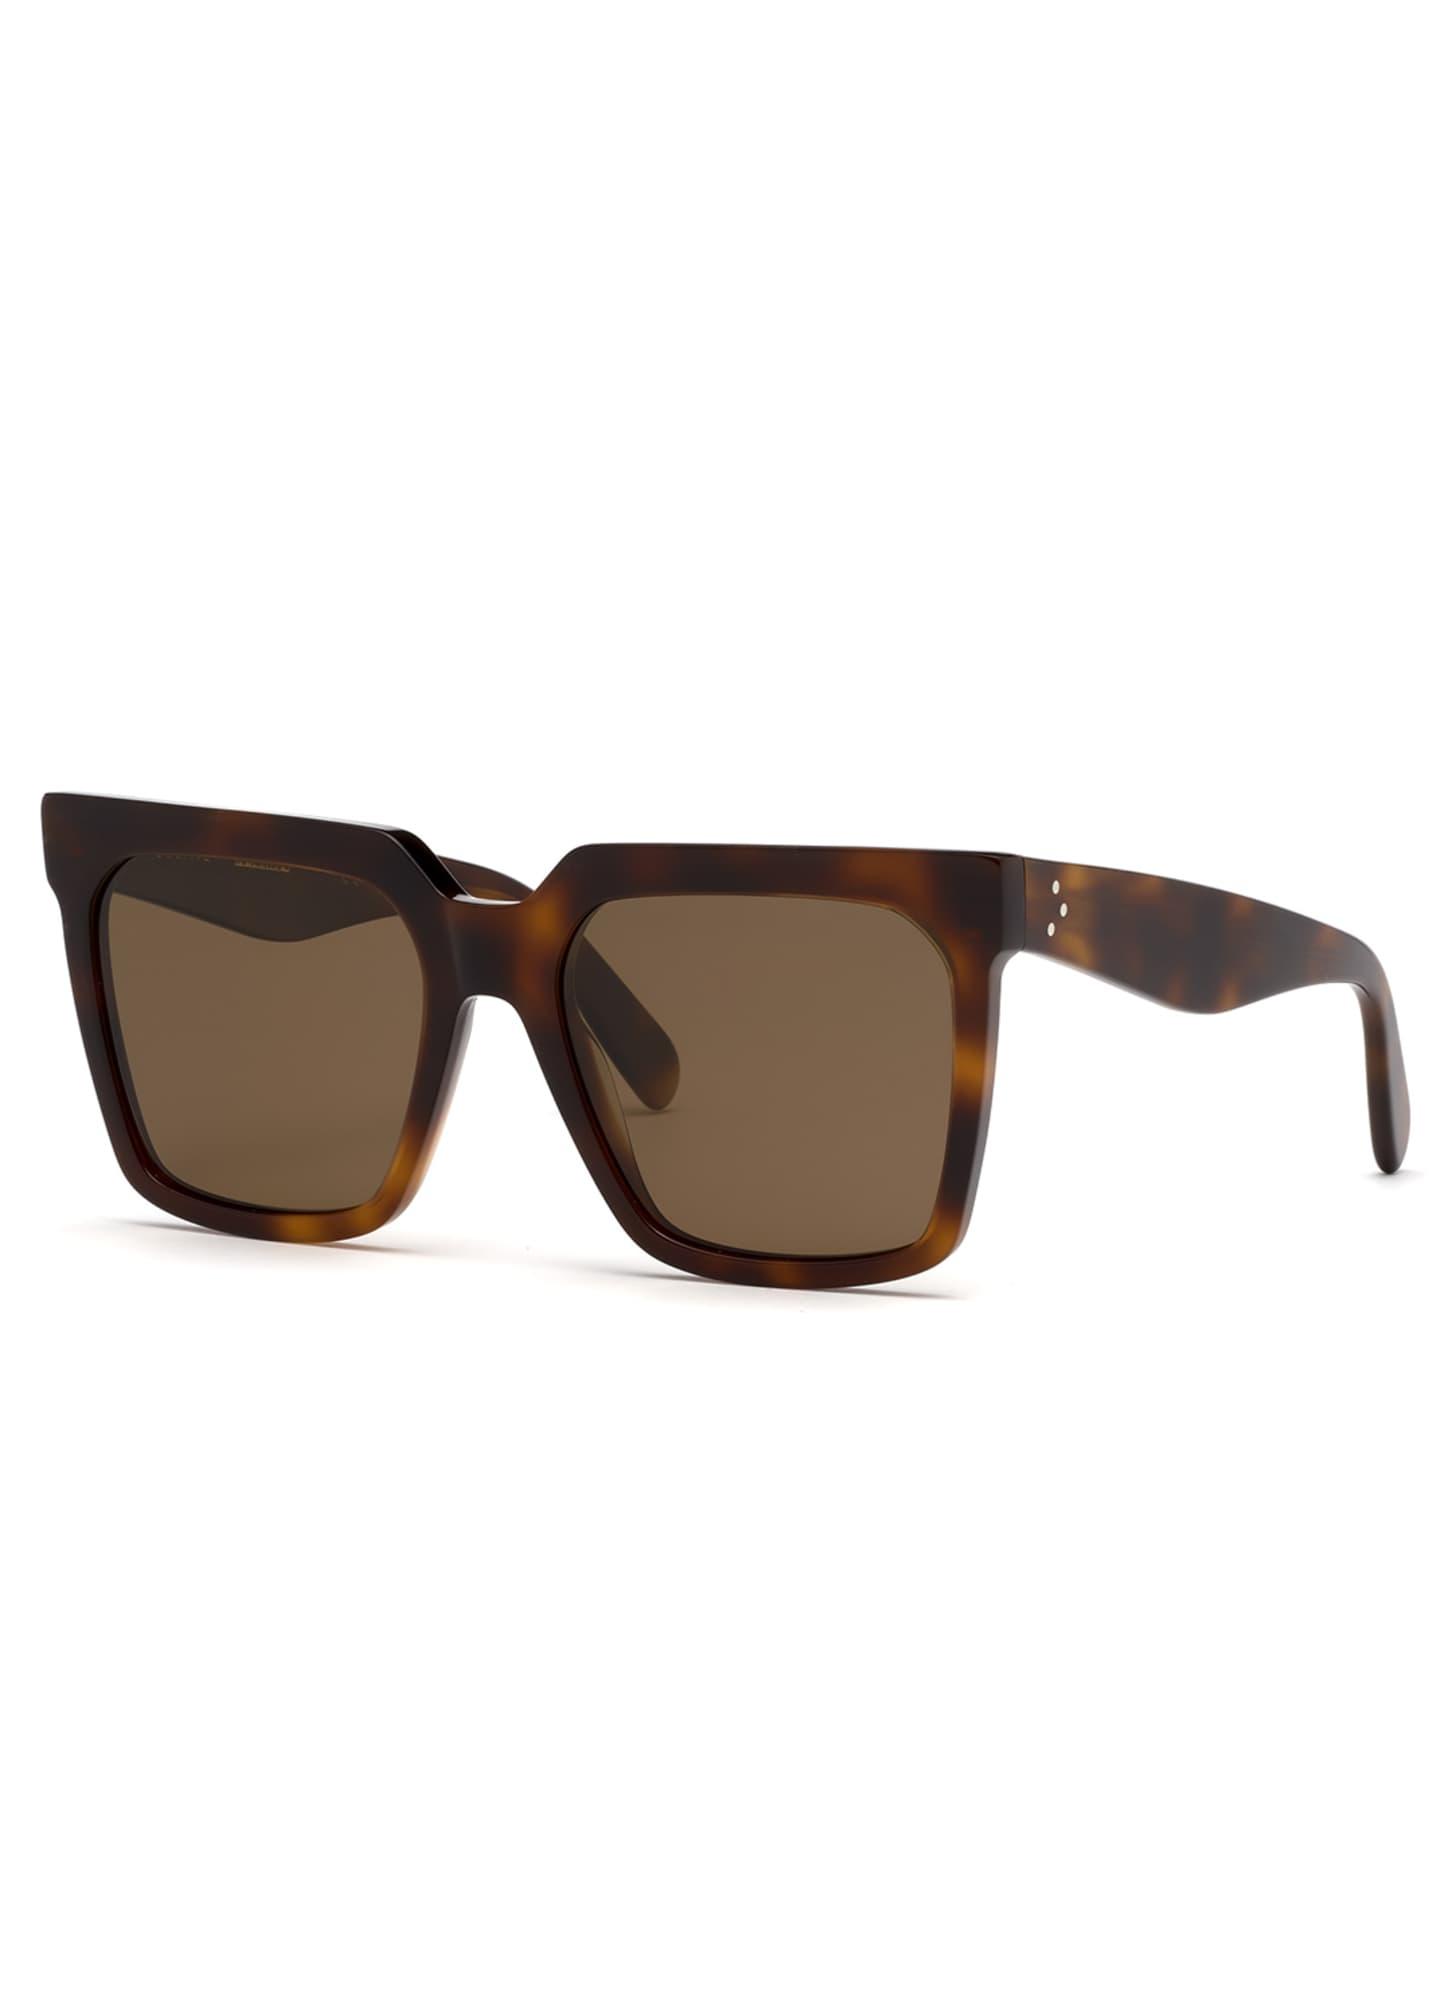 Celine Square Polarized Acetate Sunglasses